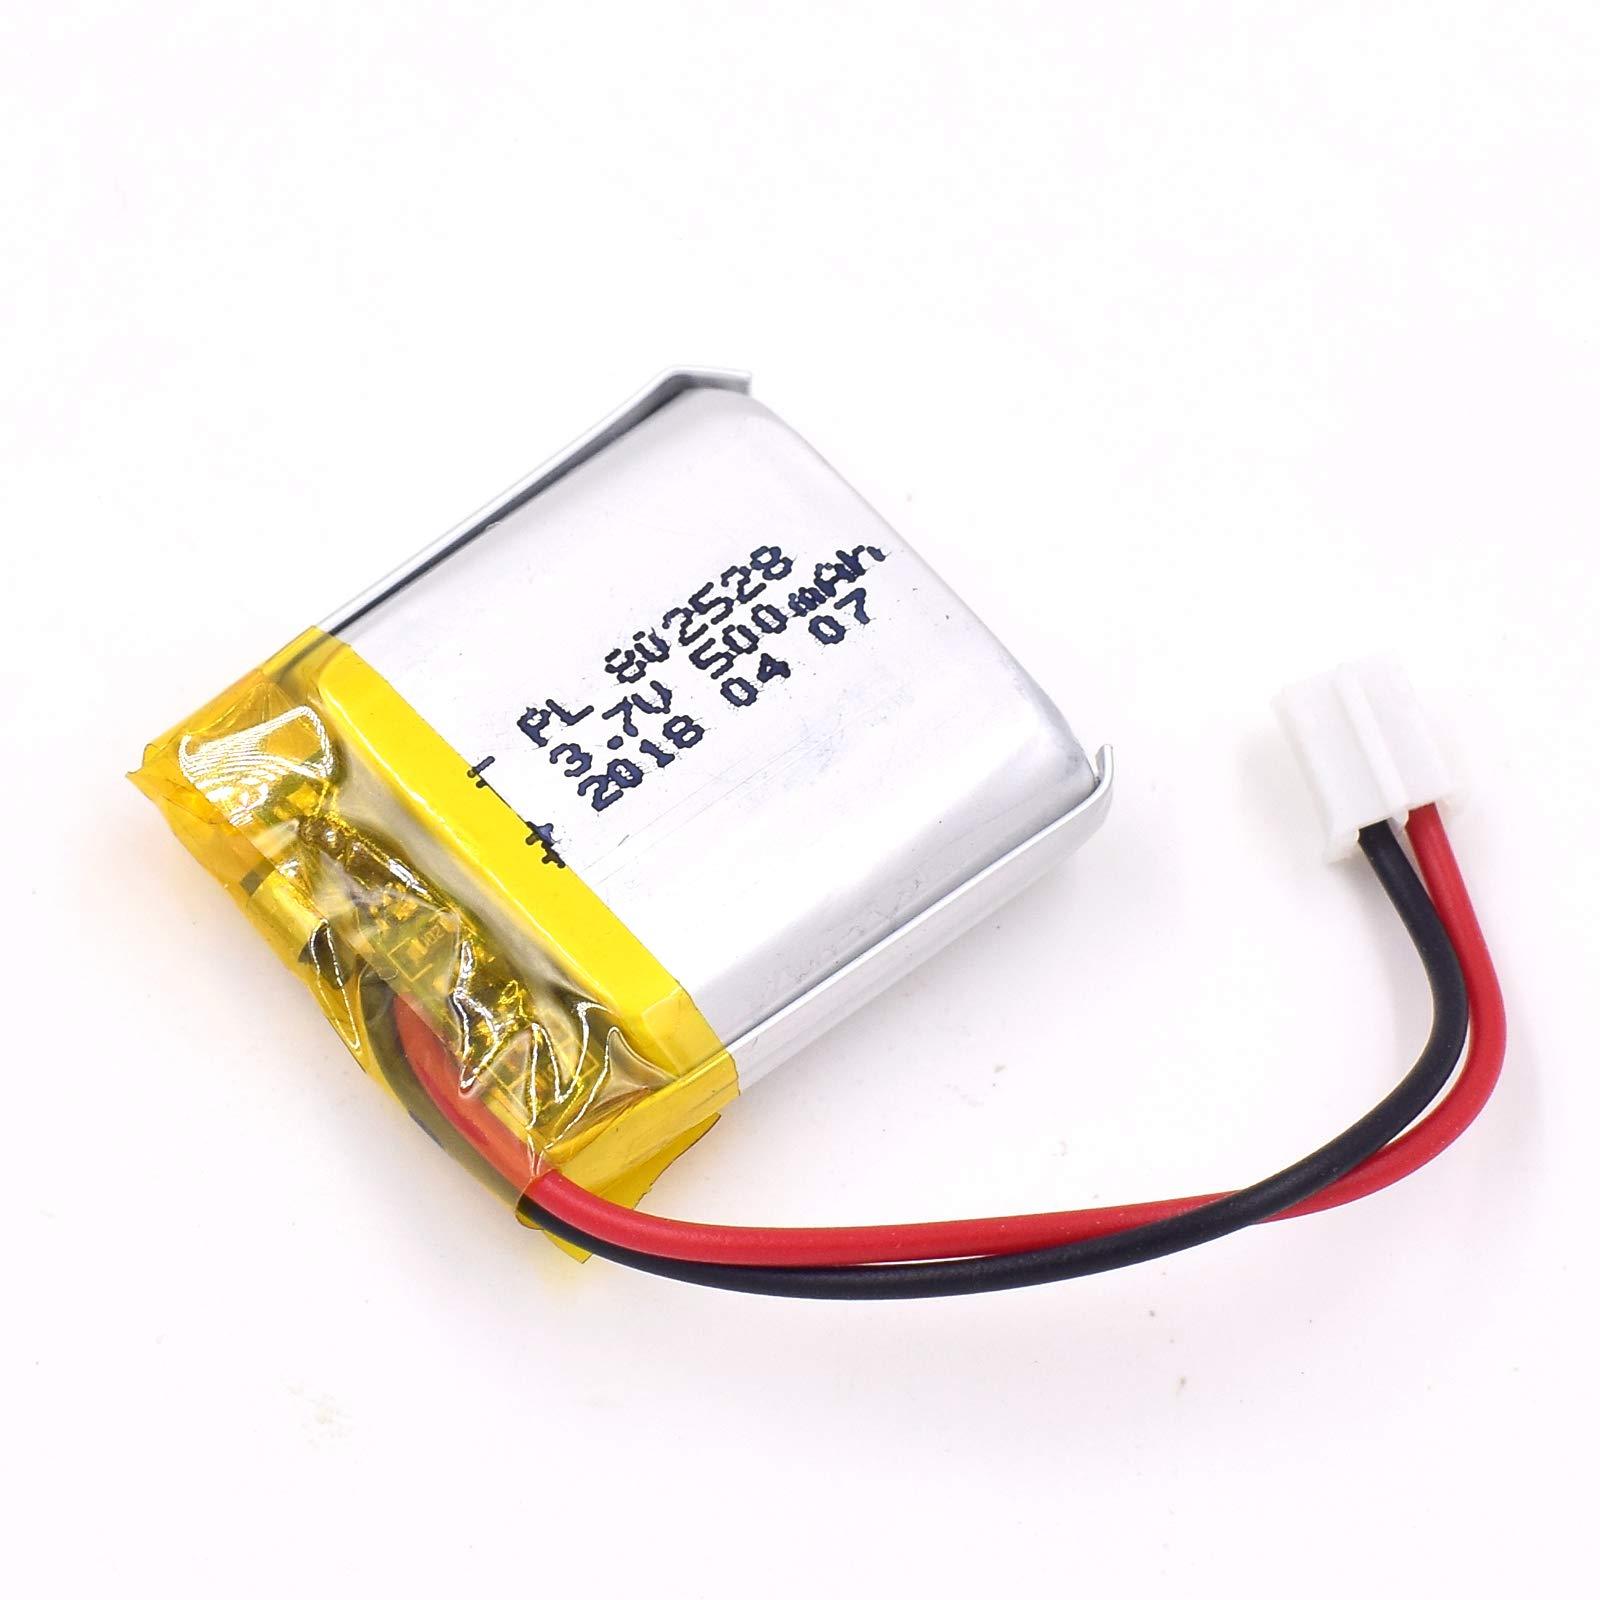 Bateria Lipo 3.7v 480mah 802528